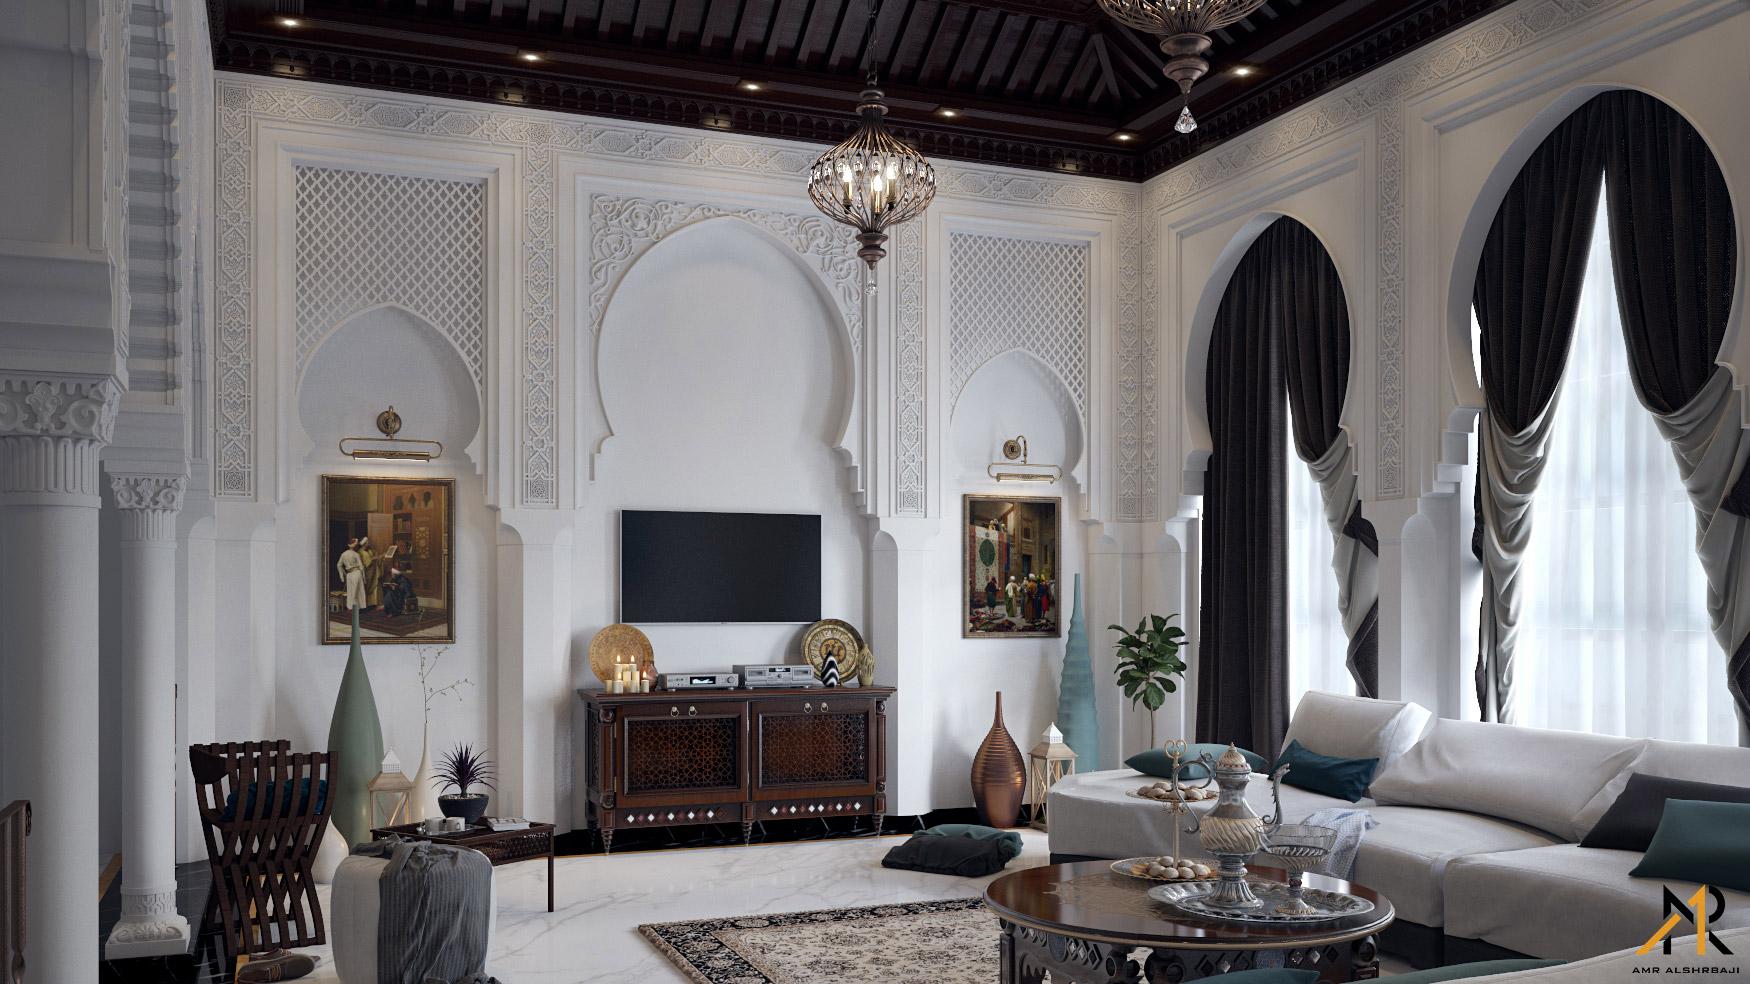 arabian style living room - HD1750×984